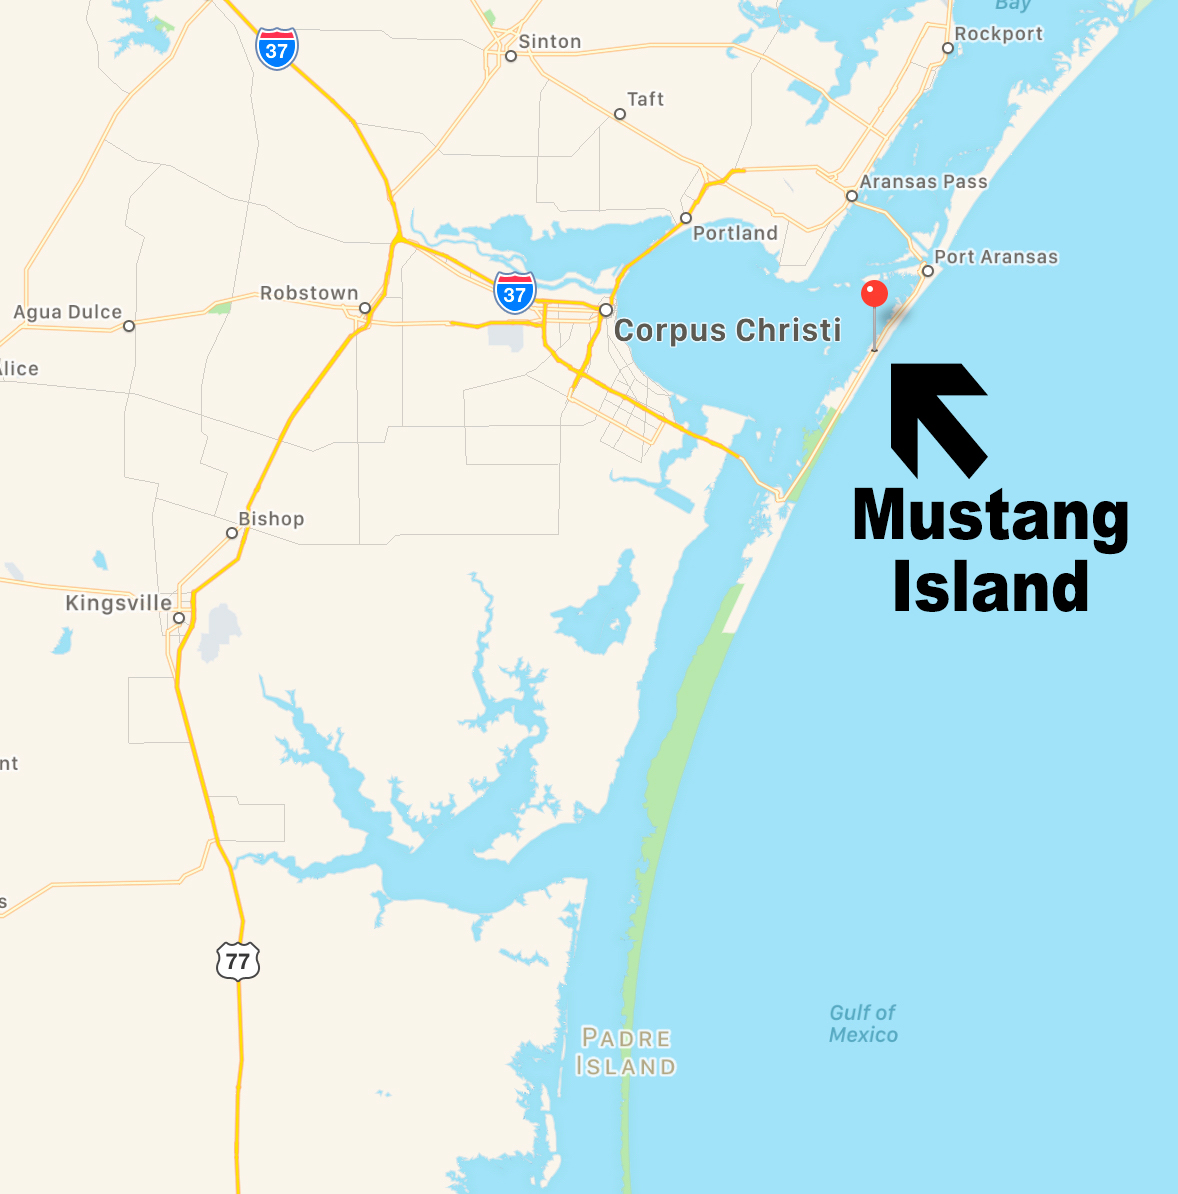 Mustang Island Beach: Another Clueless Gent Book Review